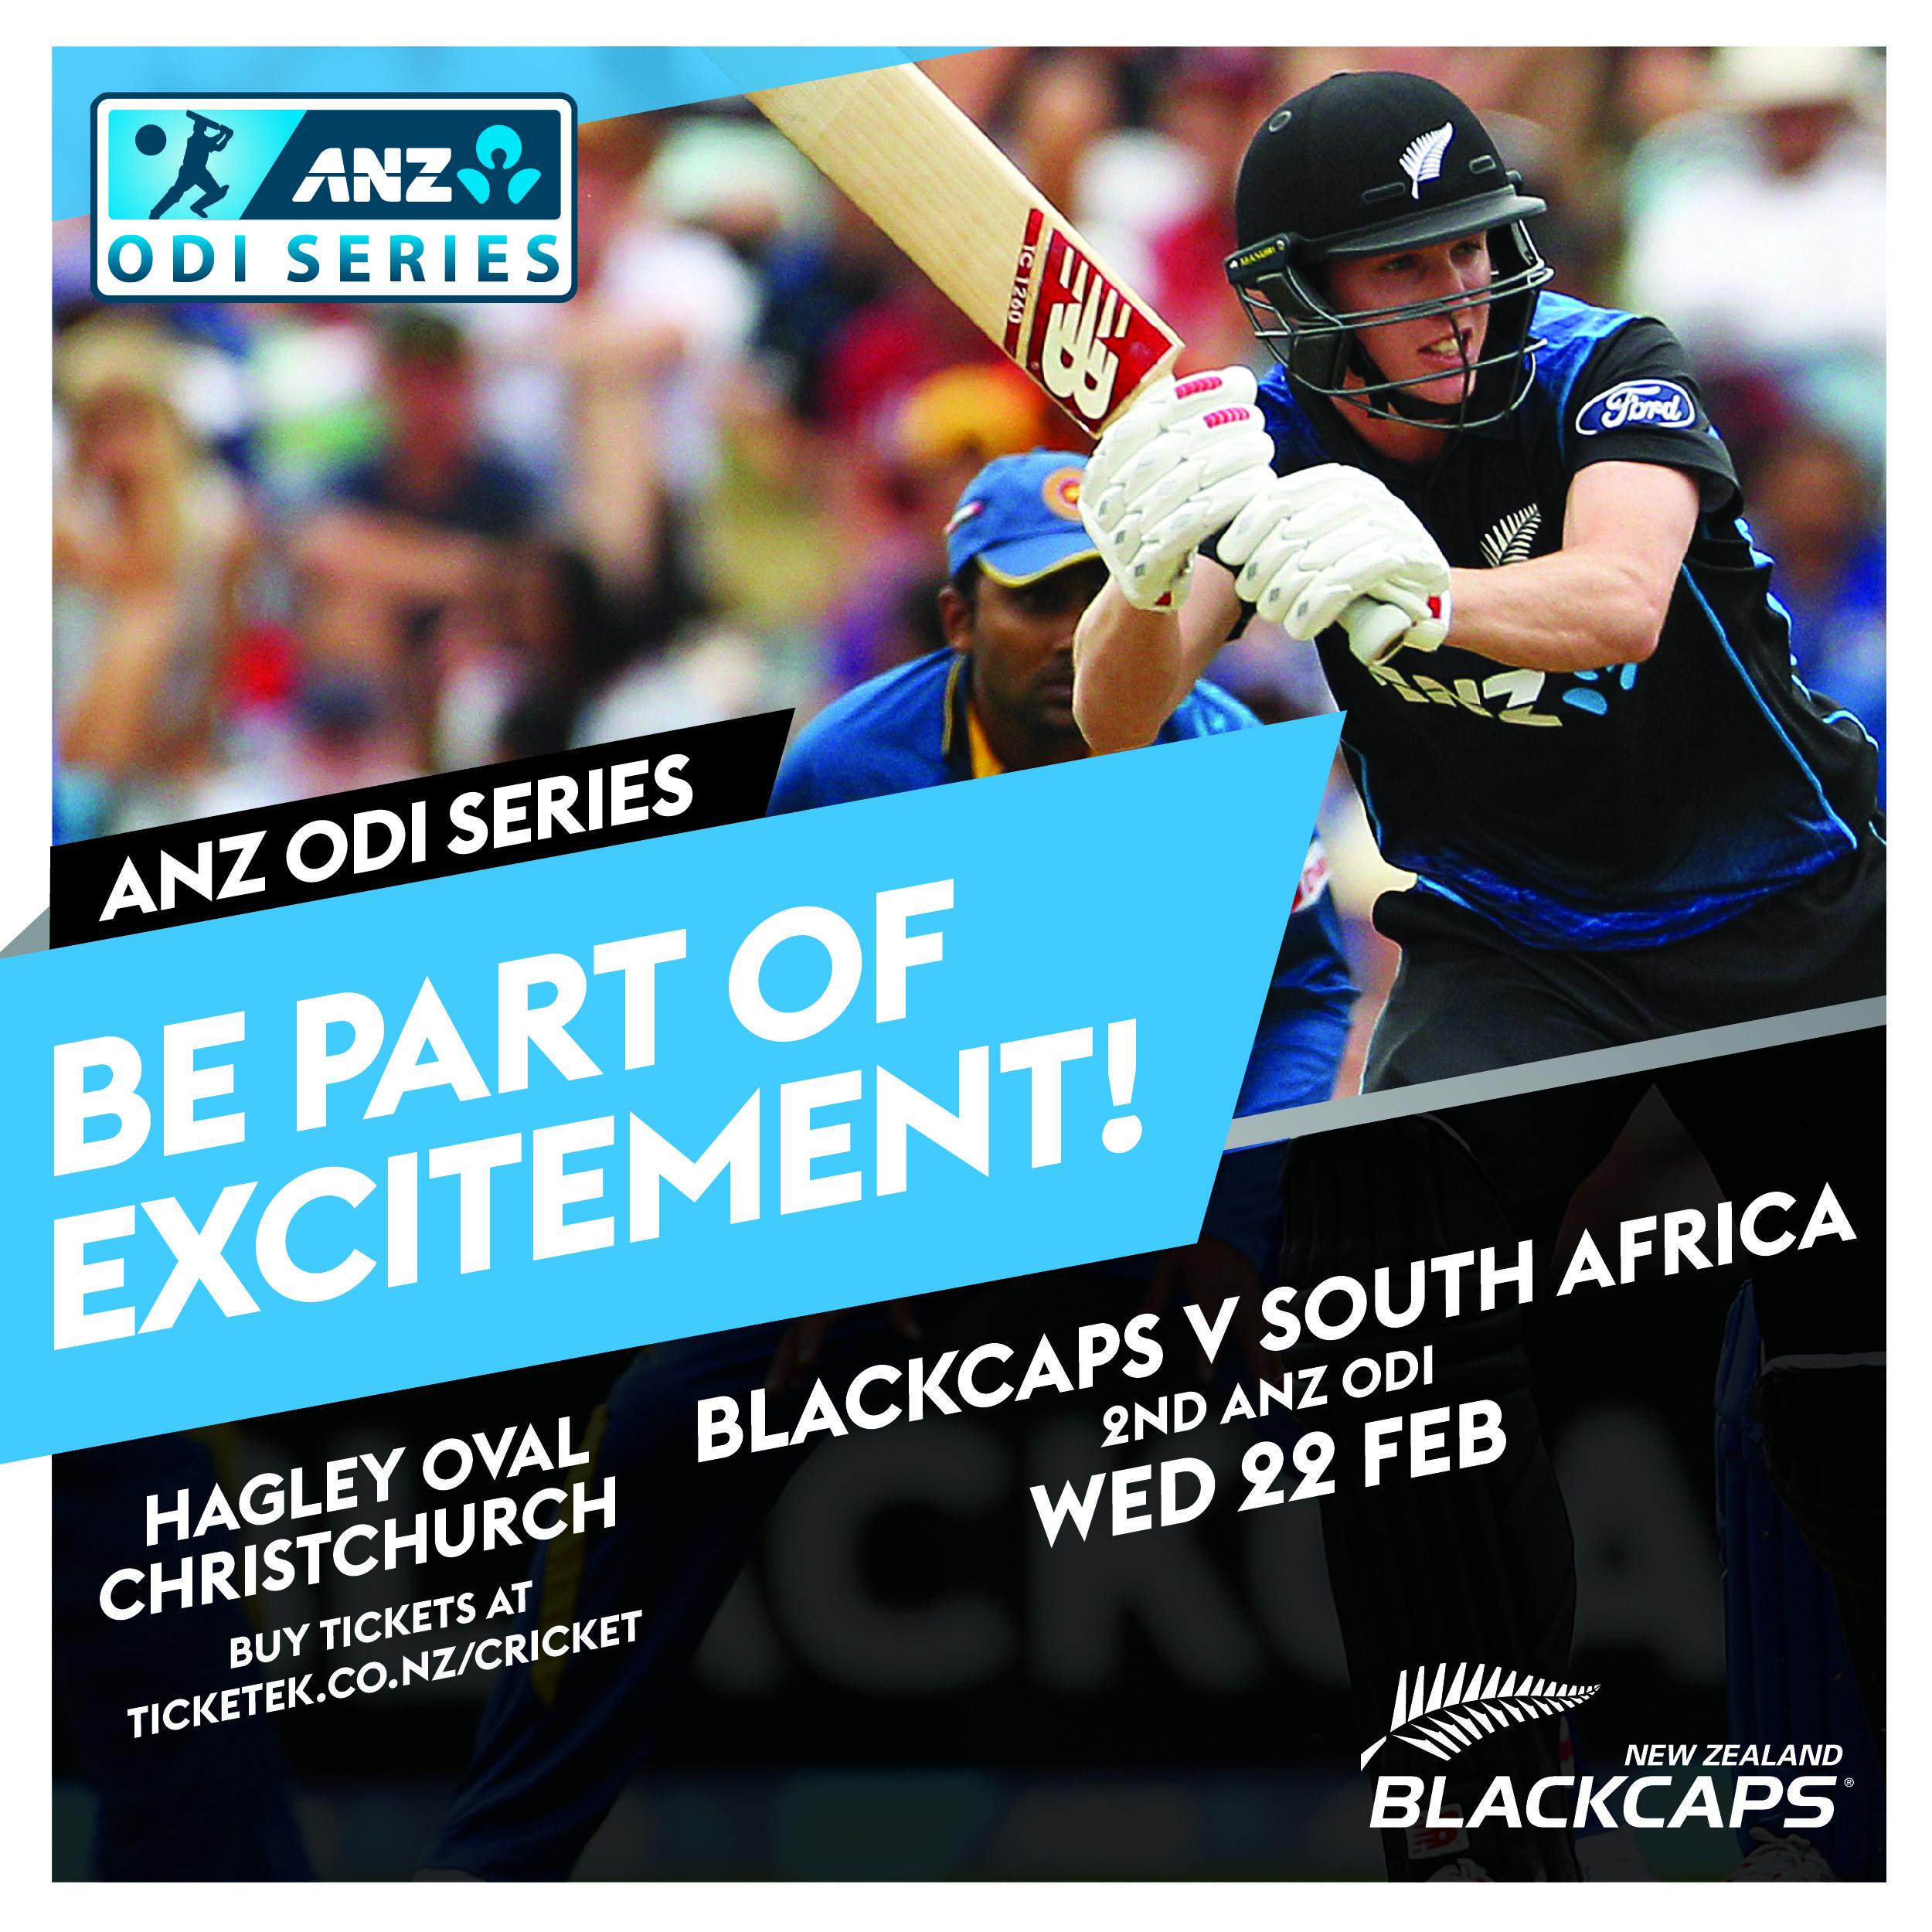 Blackcaps v South Africa ANZ International ODI 22 Feb